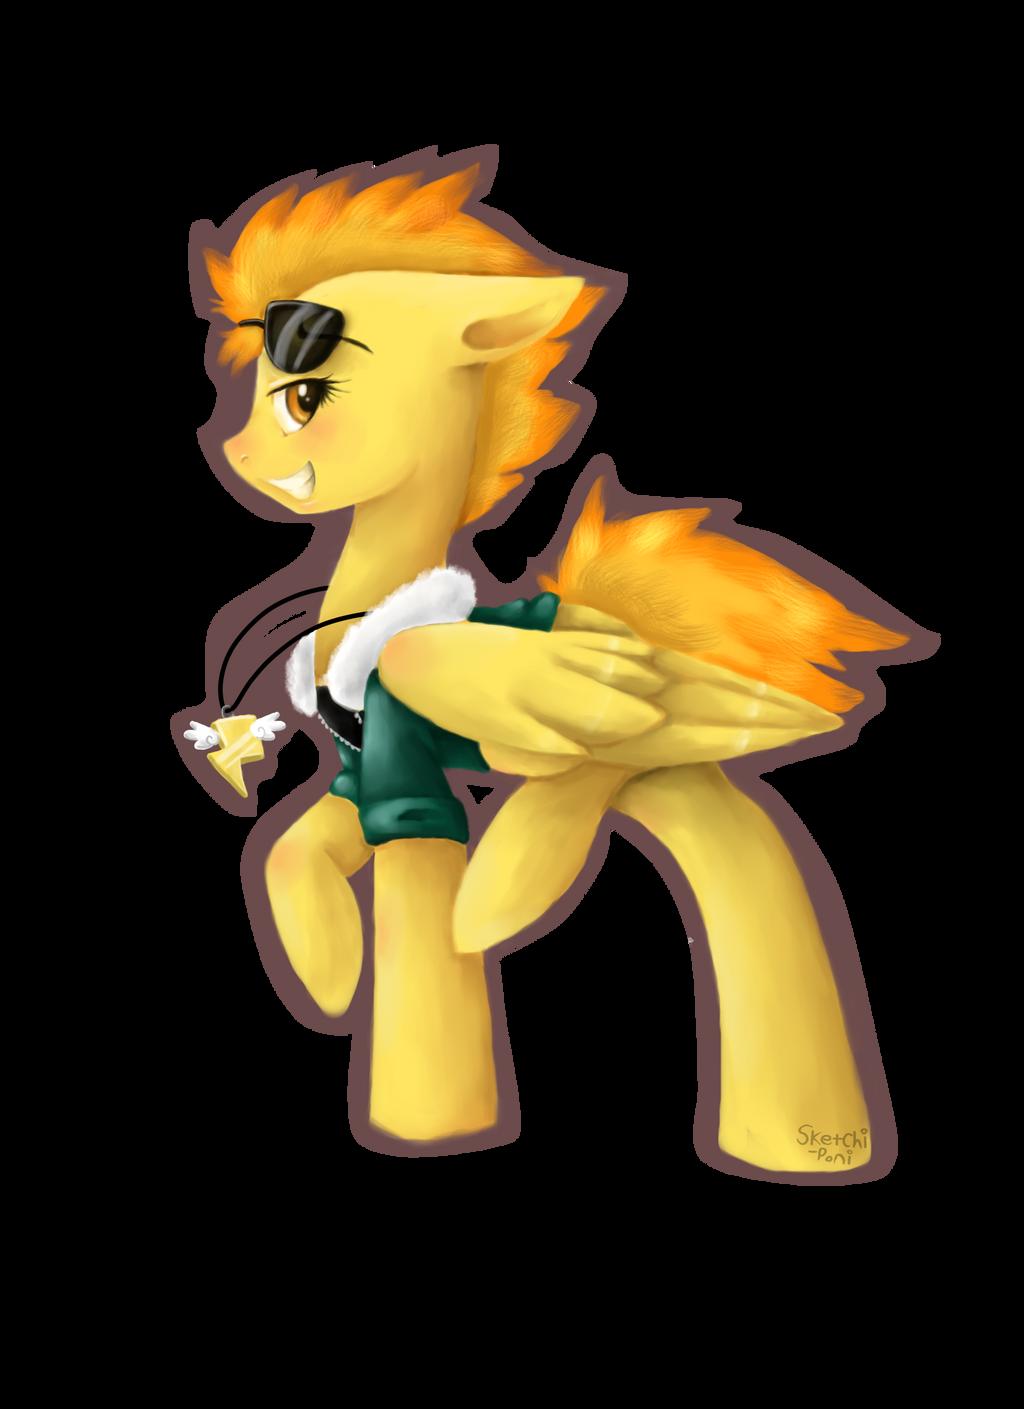 Spitfire by Sketchi-Panda